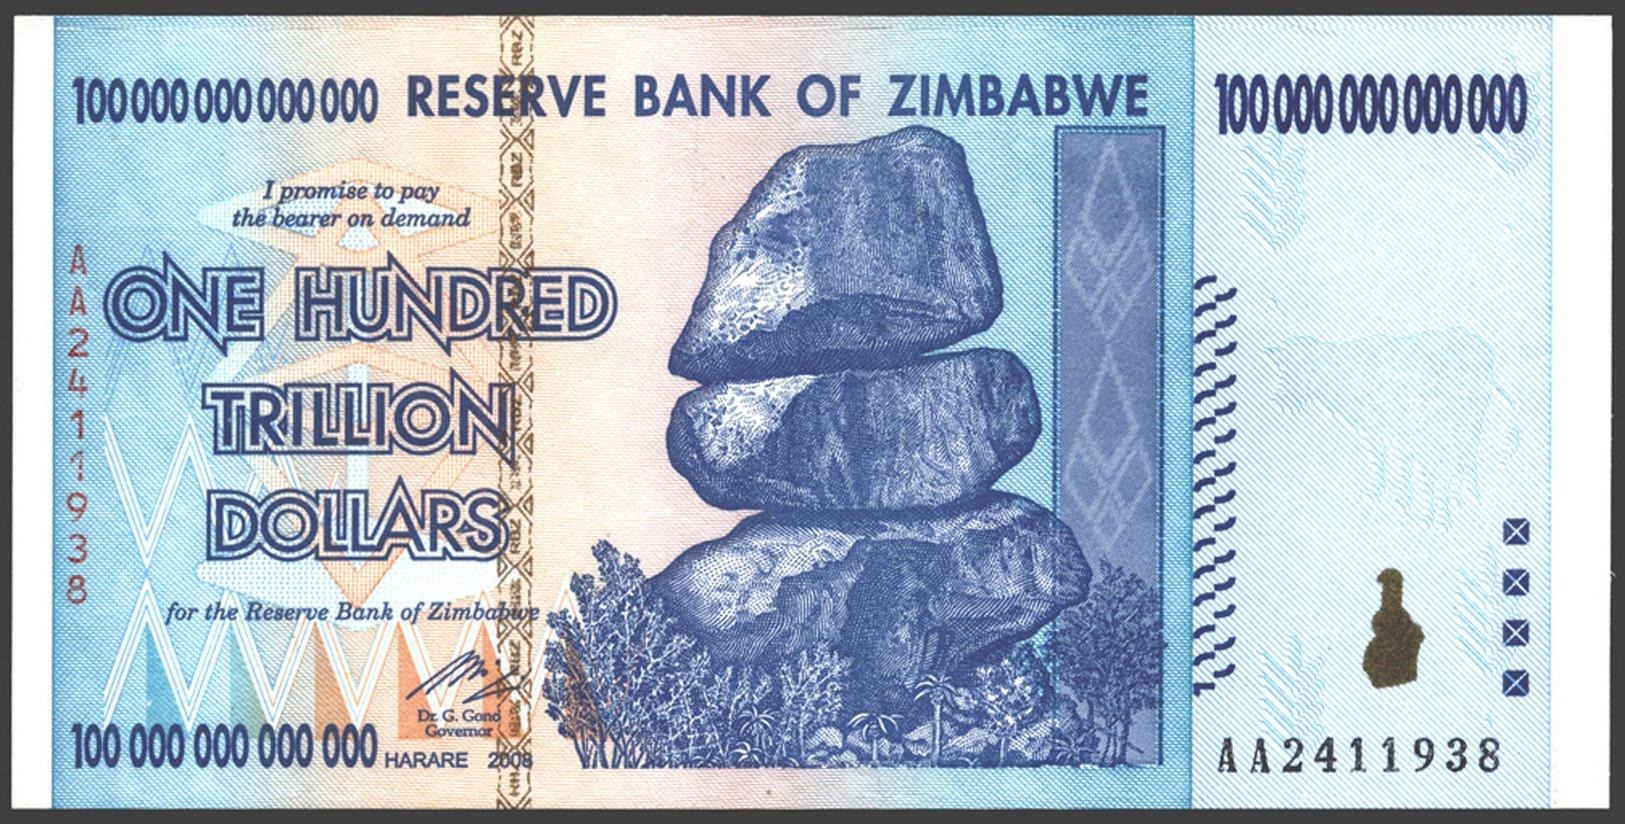 ZIMBABWE BANKNOTE, 100 000 000 000 000 DOLLARS, 2008, UNC - Zimbabwe